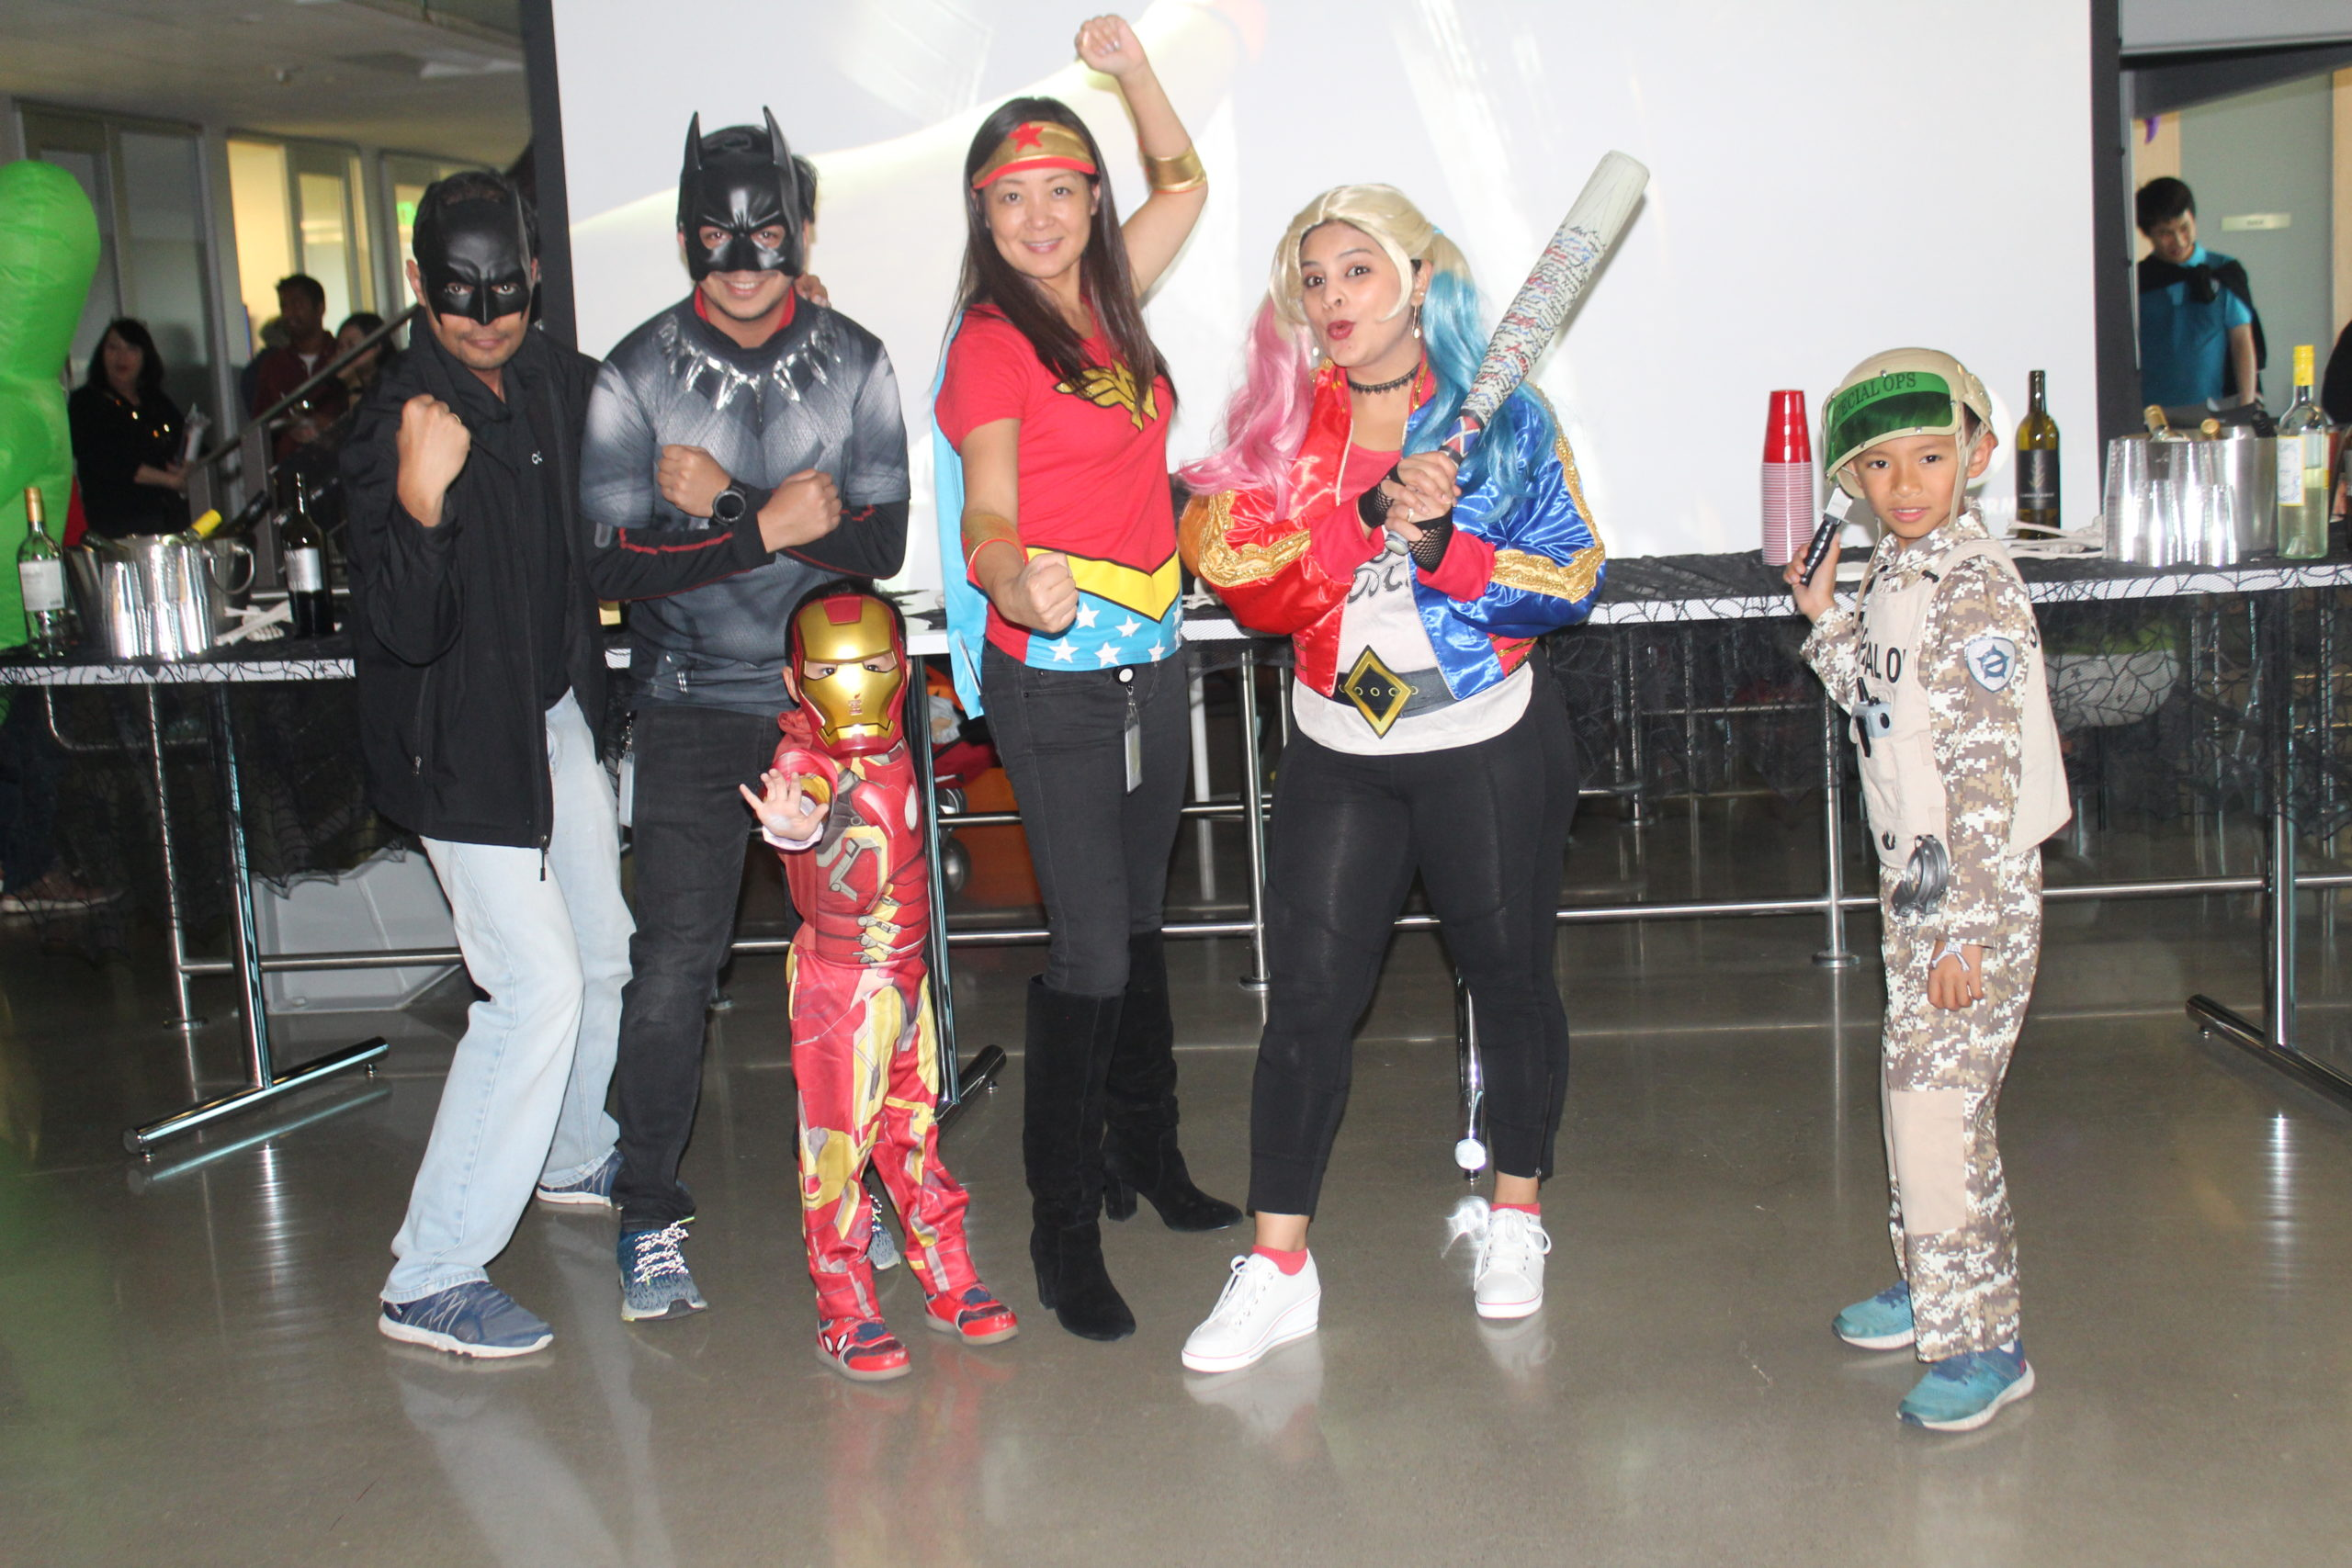 Halloween fun at Cohesity